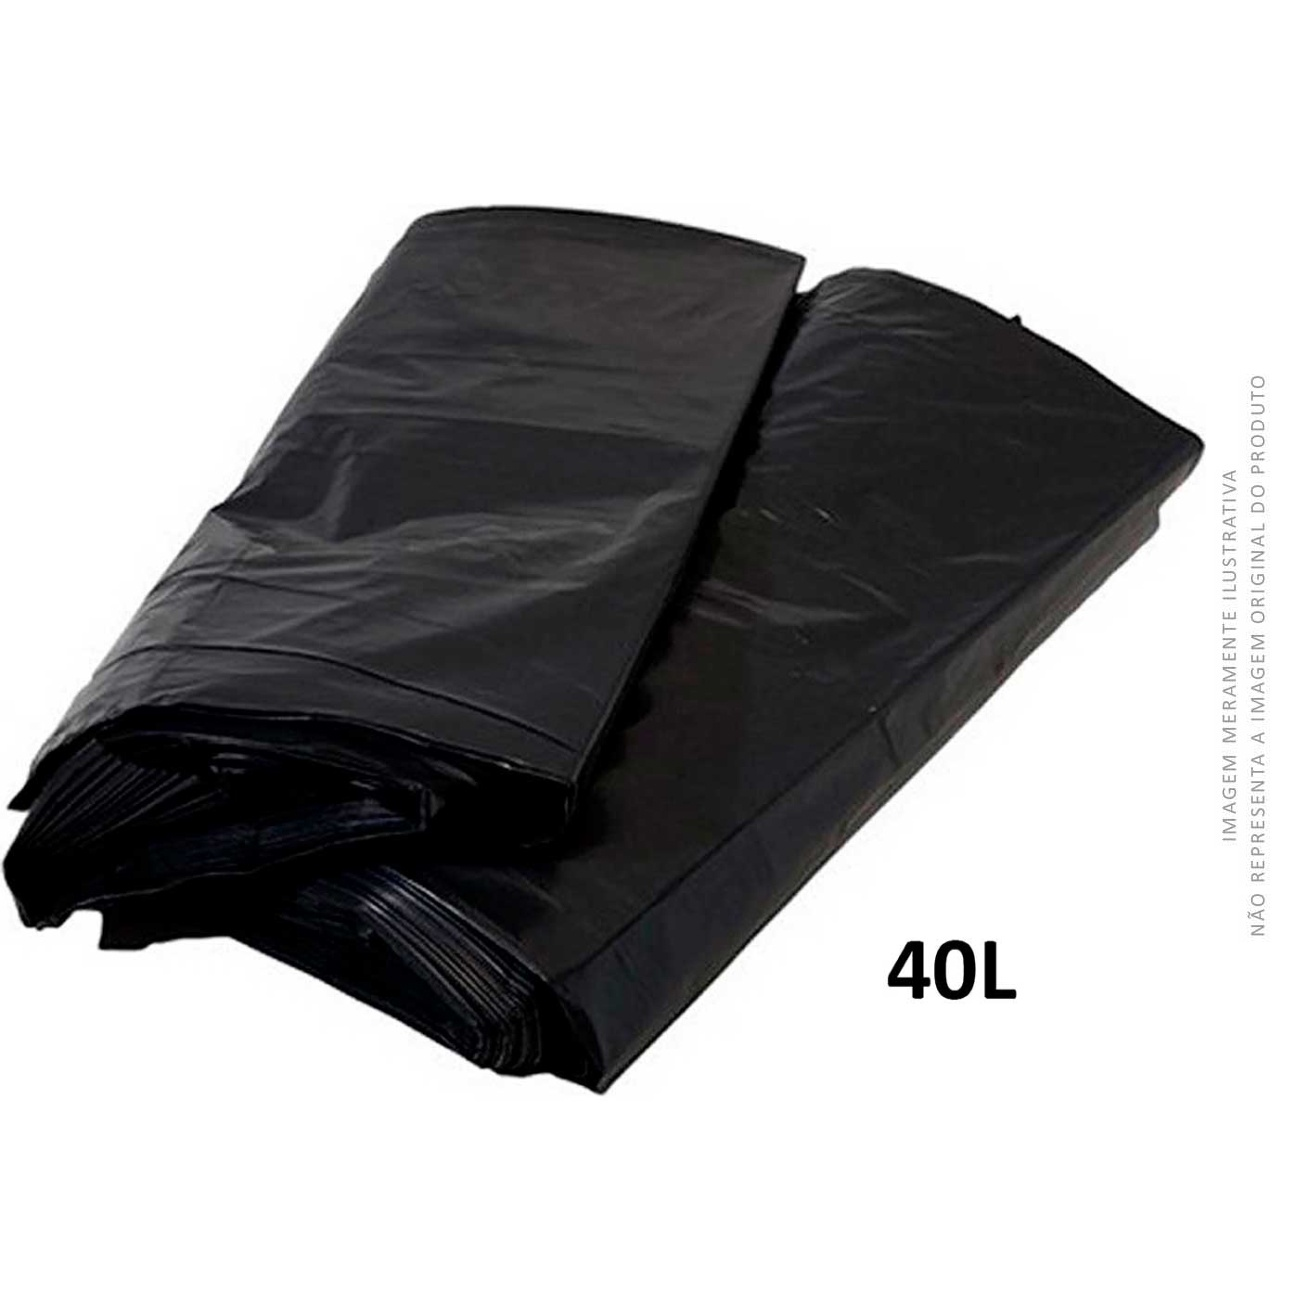 Saco De Lixo Preto MuLlixo 40L    Caixa com 15 unidades